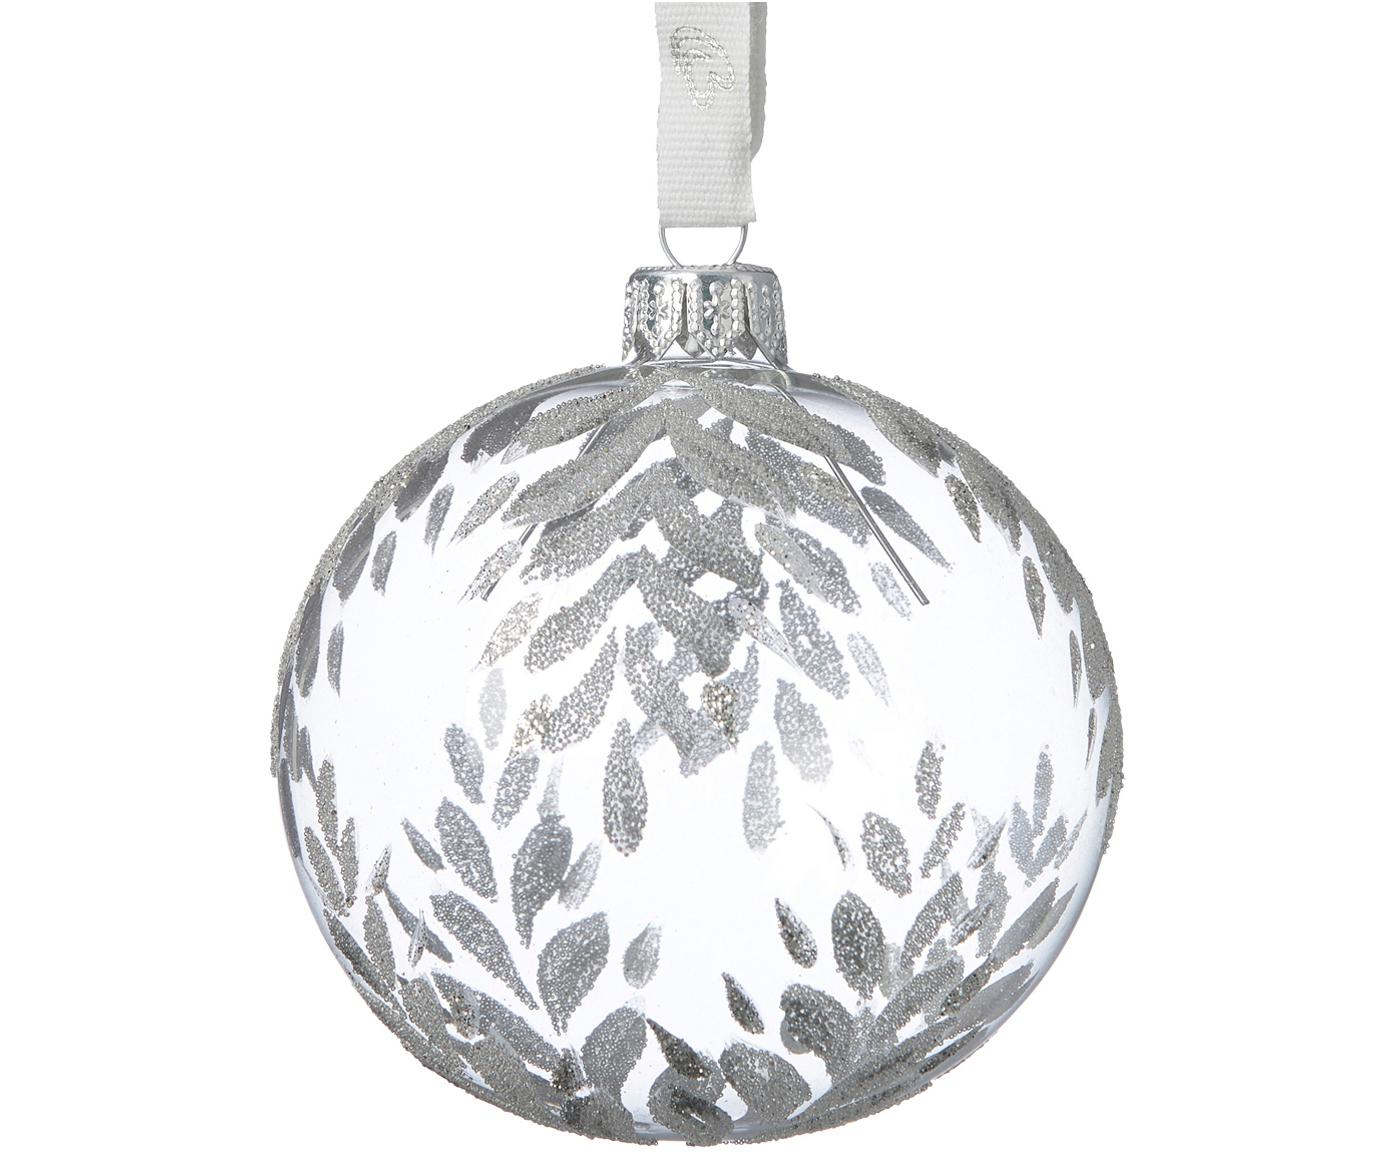 Palline di Natale Cadelia Ø 8 cm, 2 pz, Trasparente, argentato, Ø 8 cm